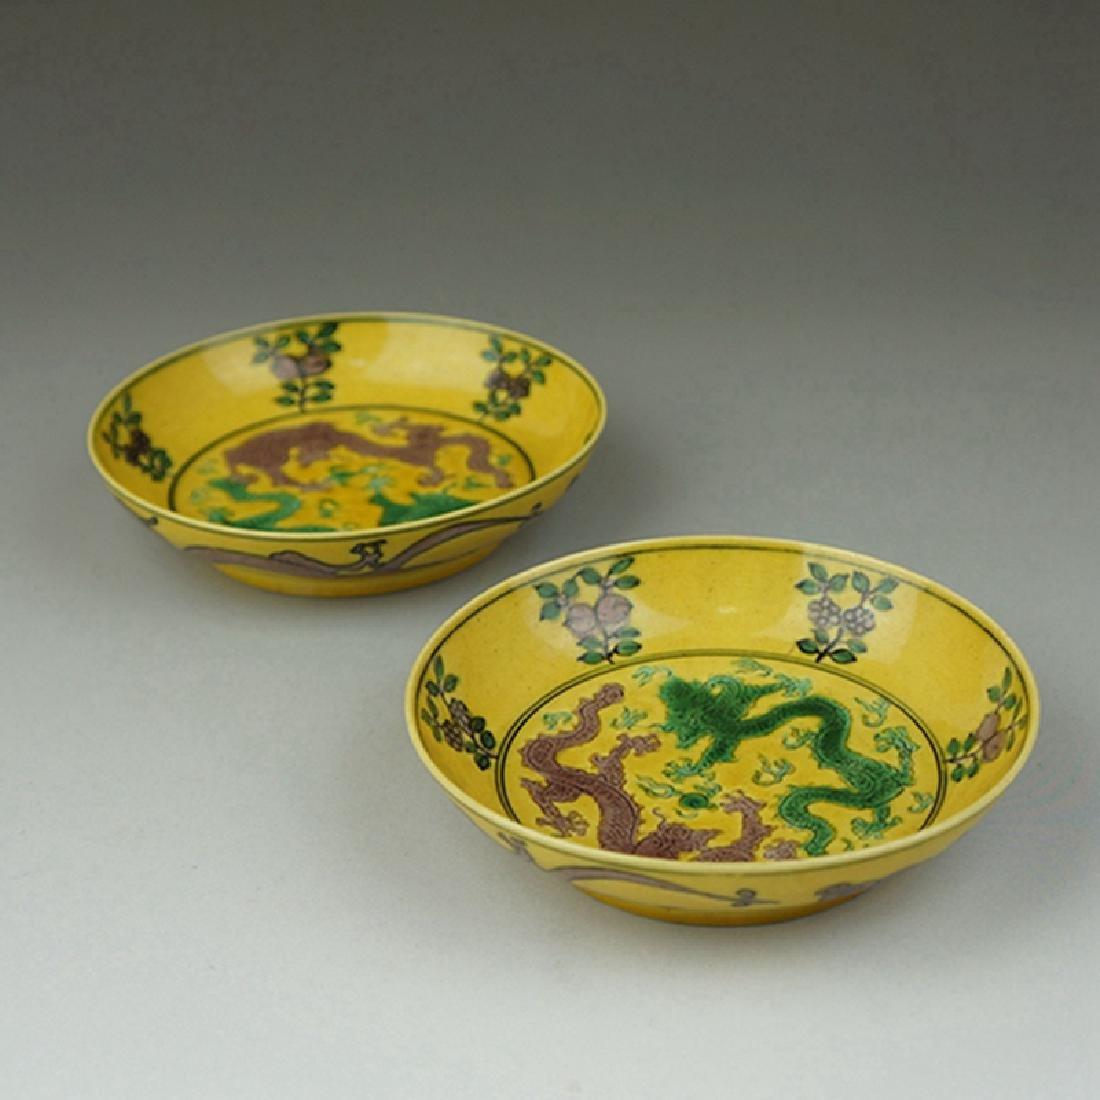 Pair Chinese Porcelain Plates Guangxu Mark - 2